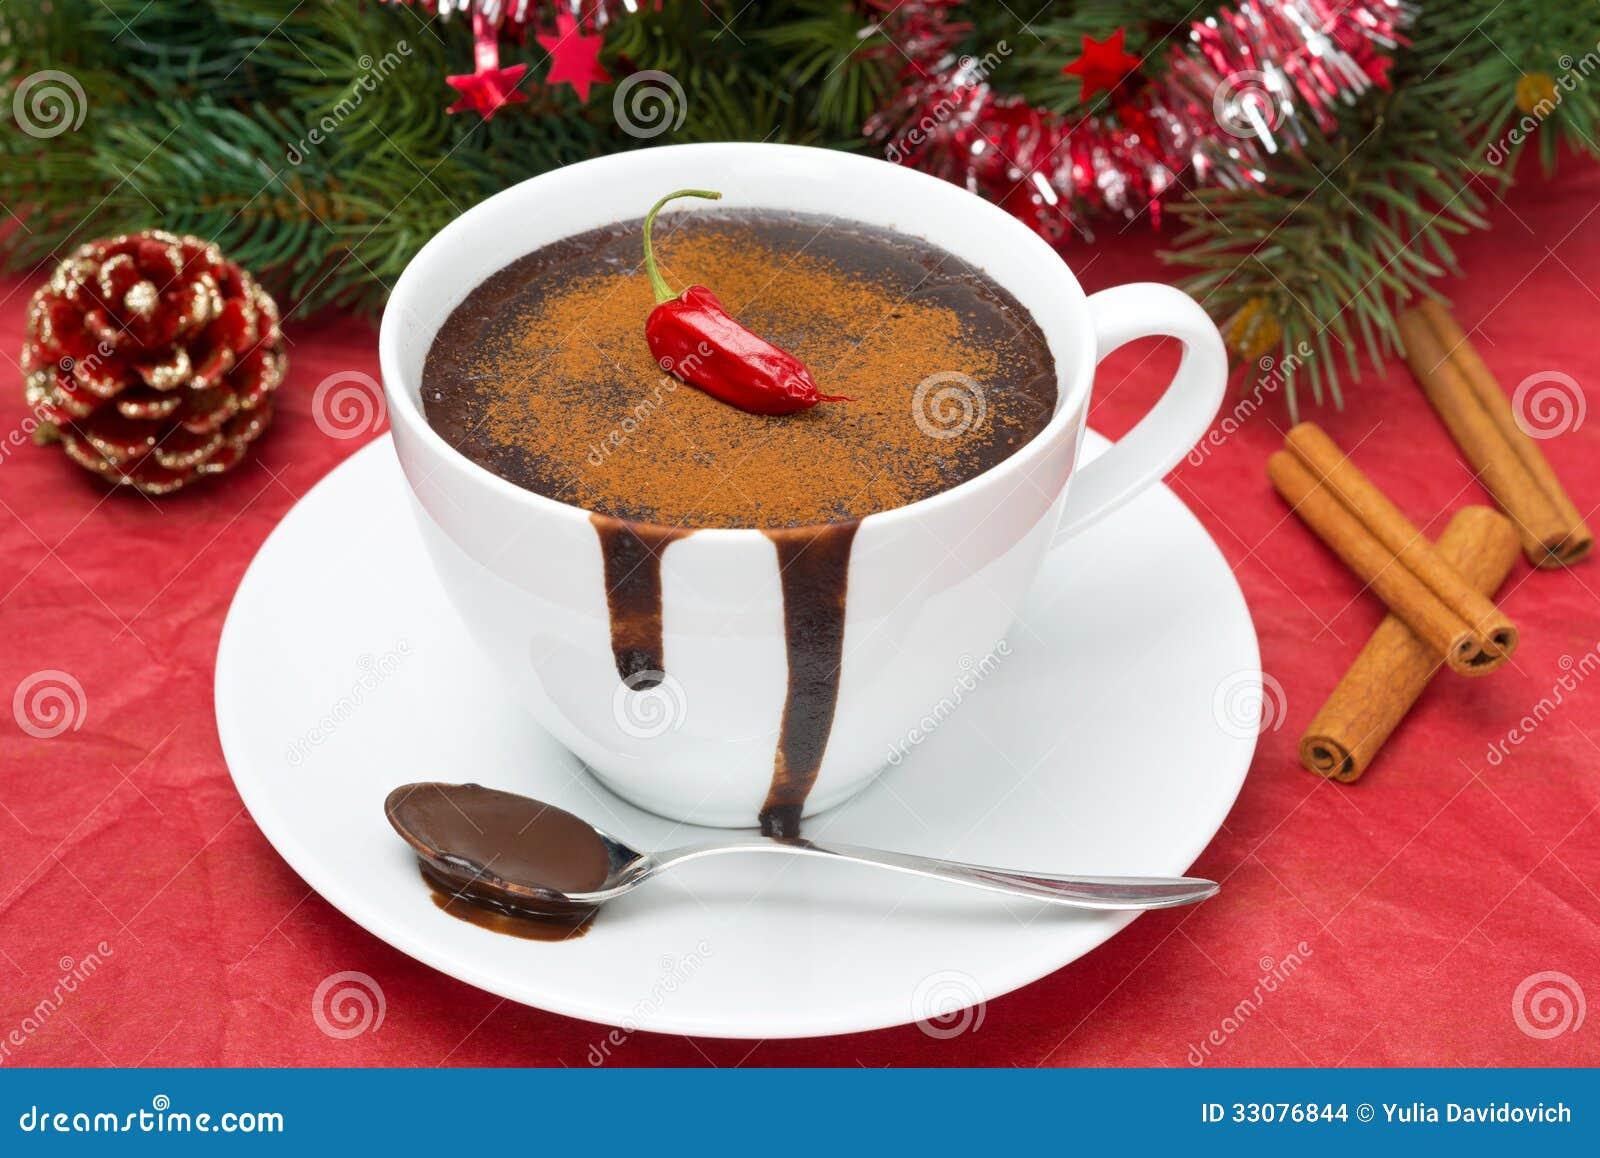 Hot Chocolate With Chili, Cinnamon For Christmas Royalty Free ...